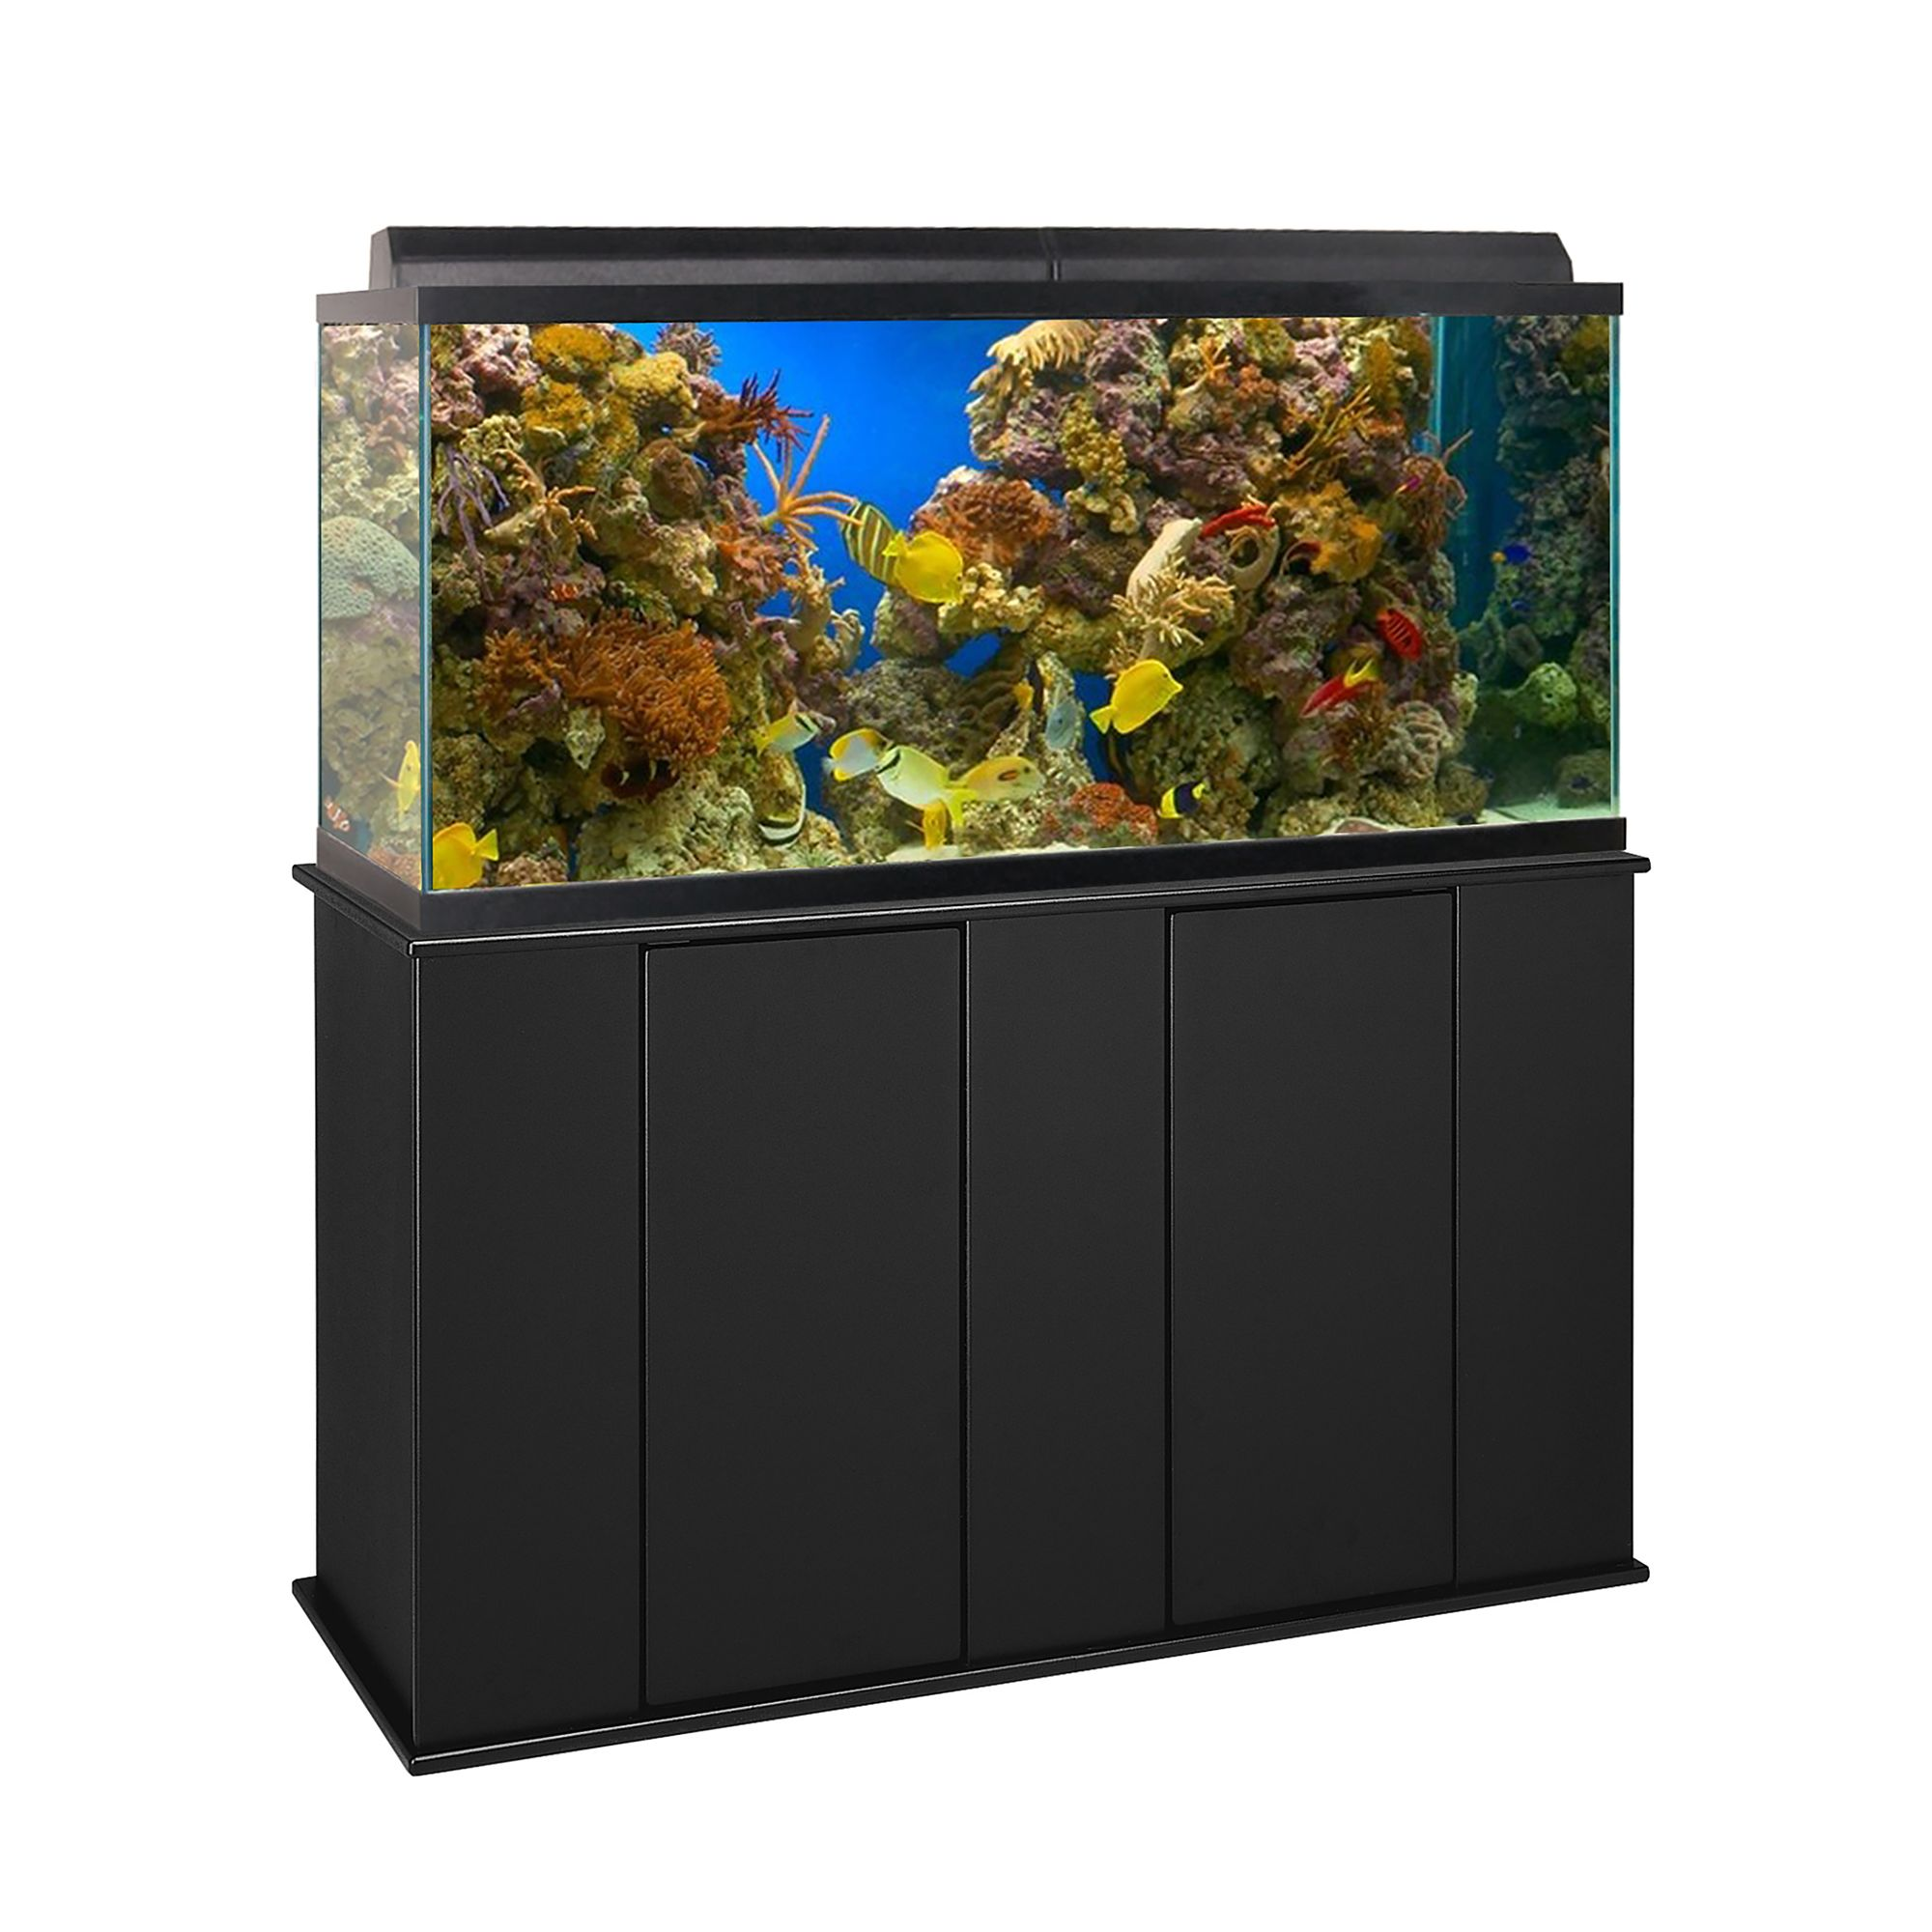 Marco 75-90 Gallon Upright Aquarium Stand, Black 5245771